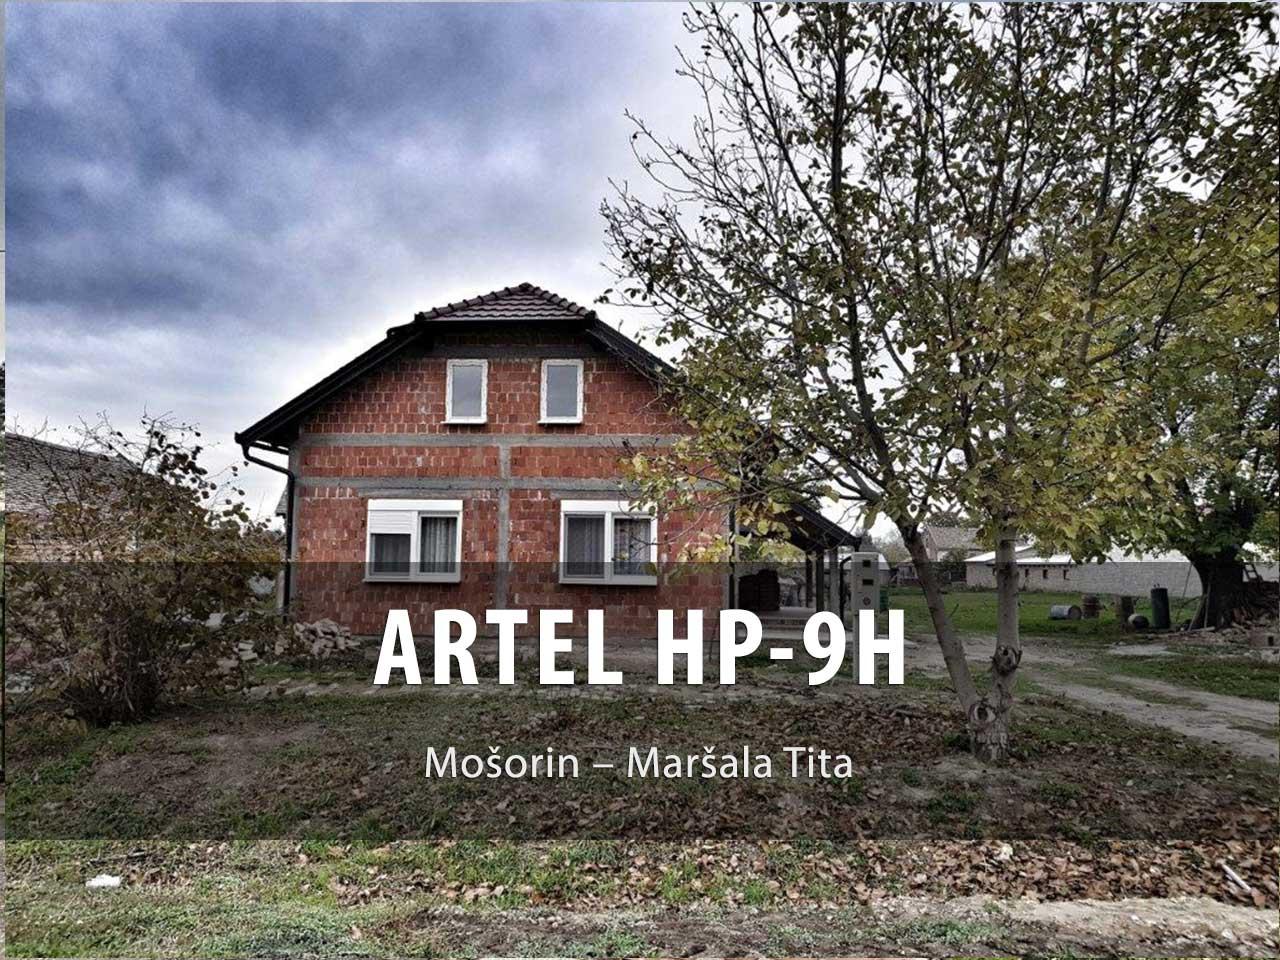 ARTEL HP-9H